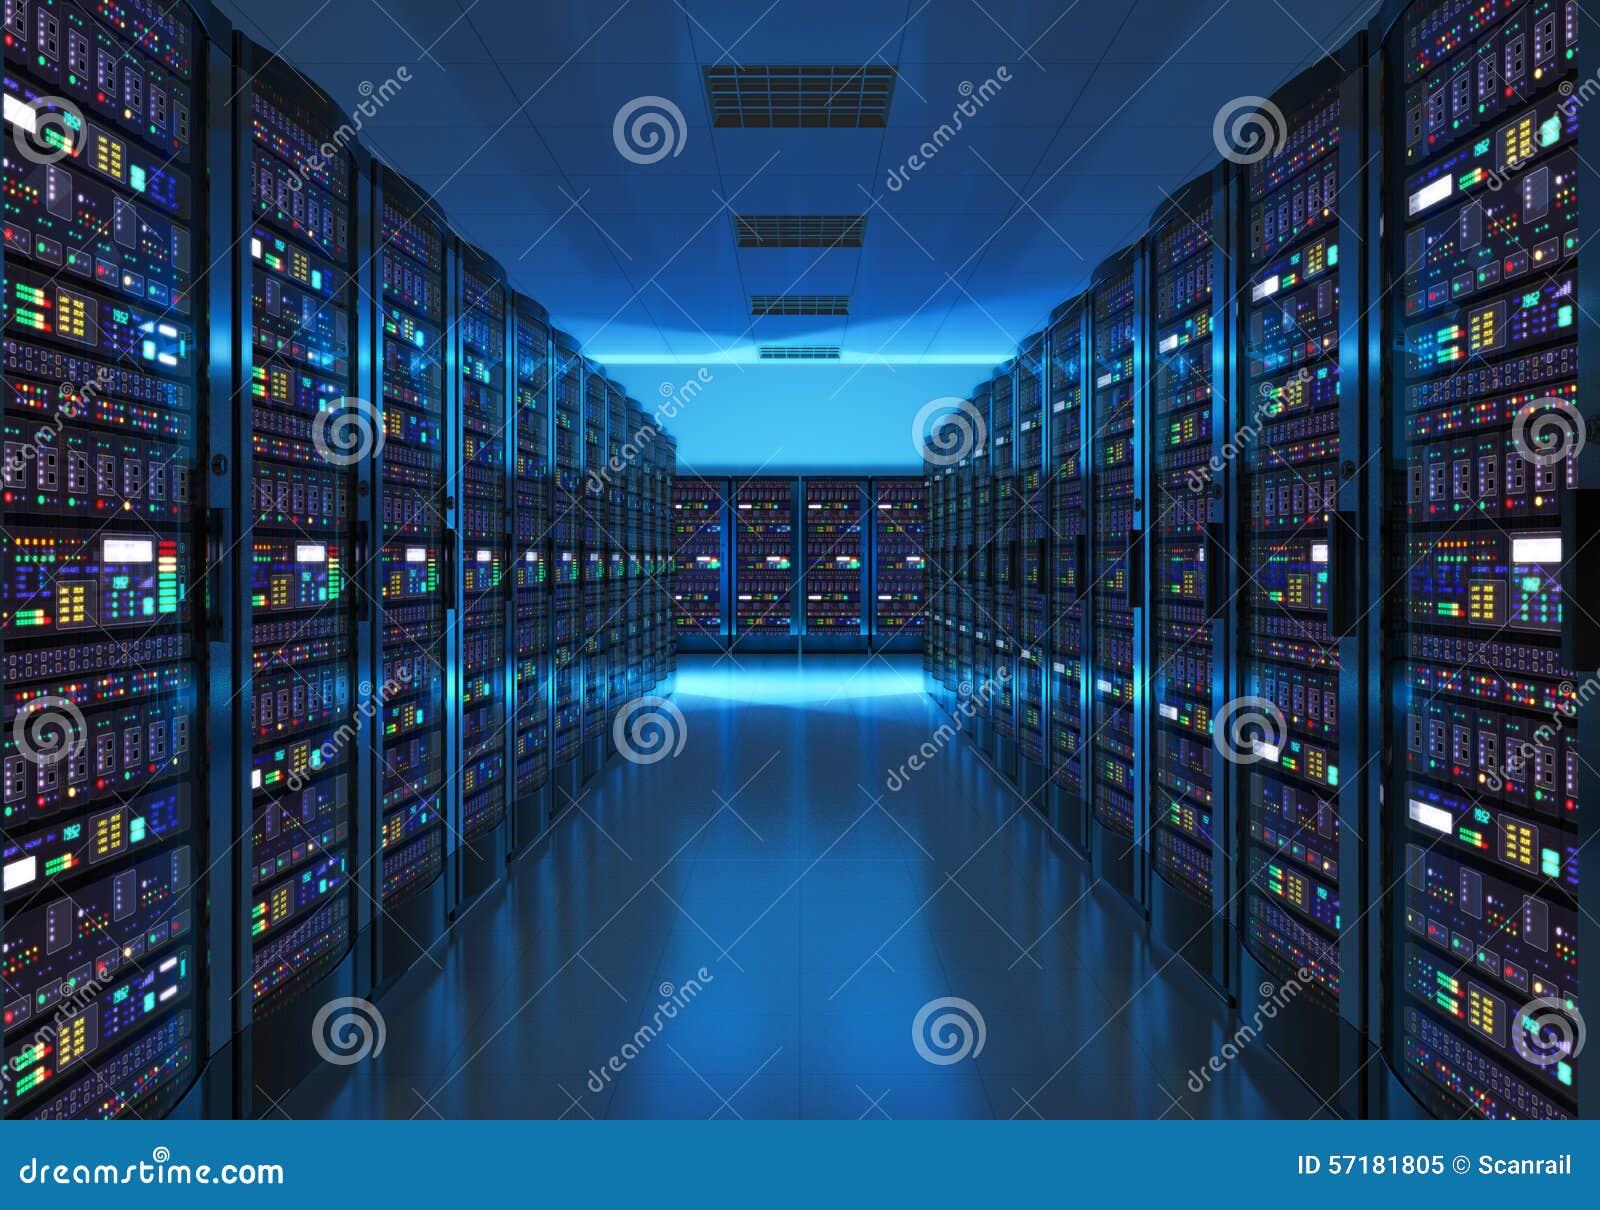 book business information technology management